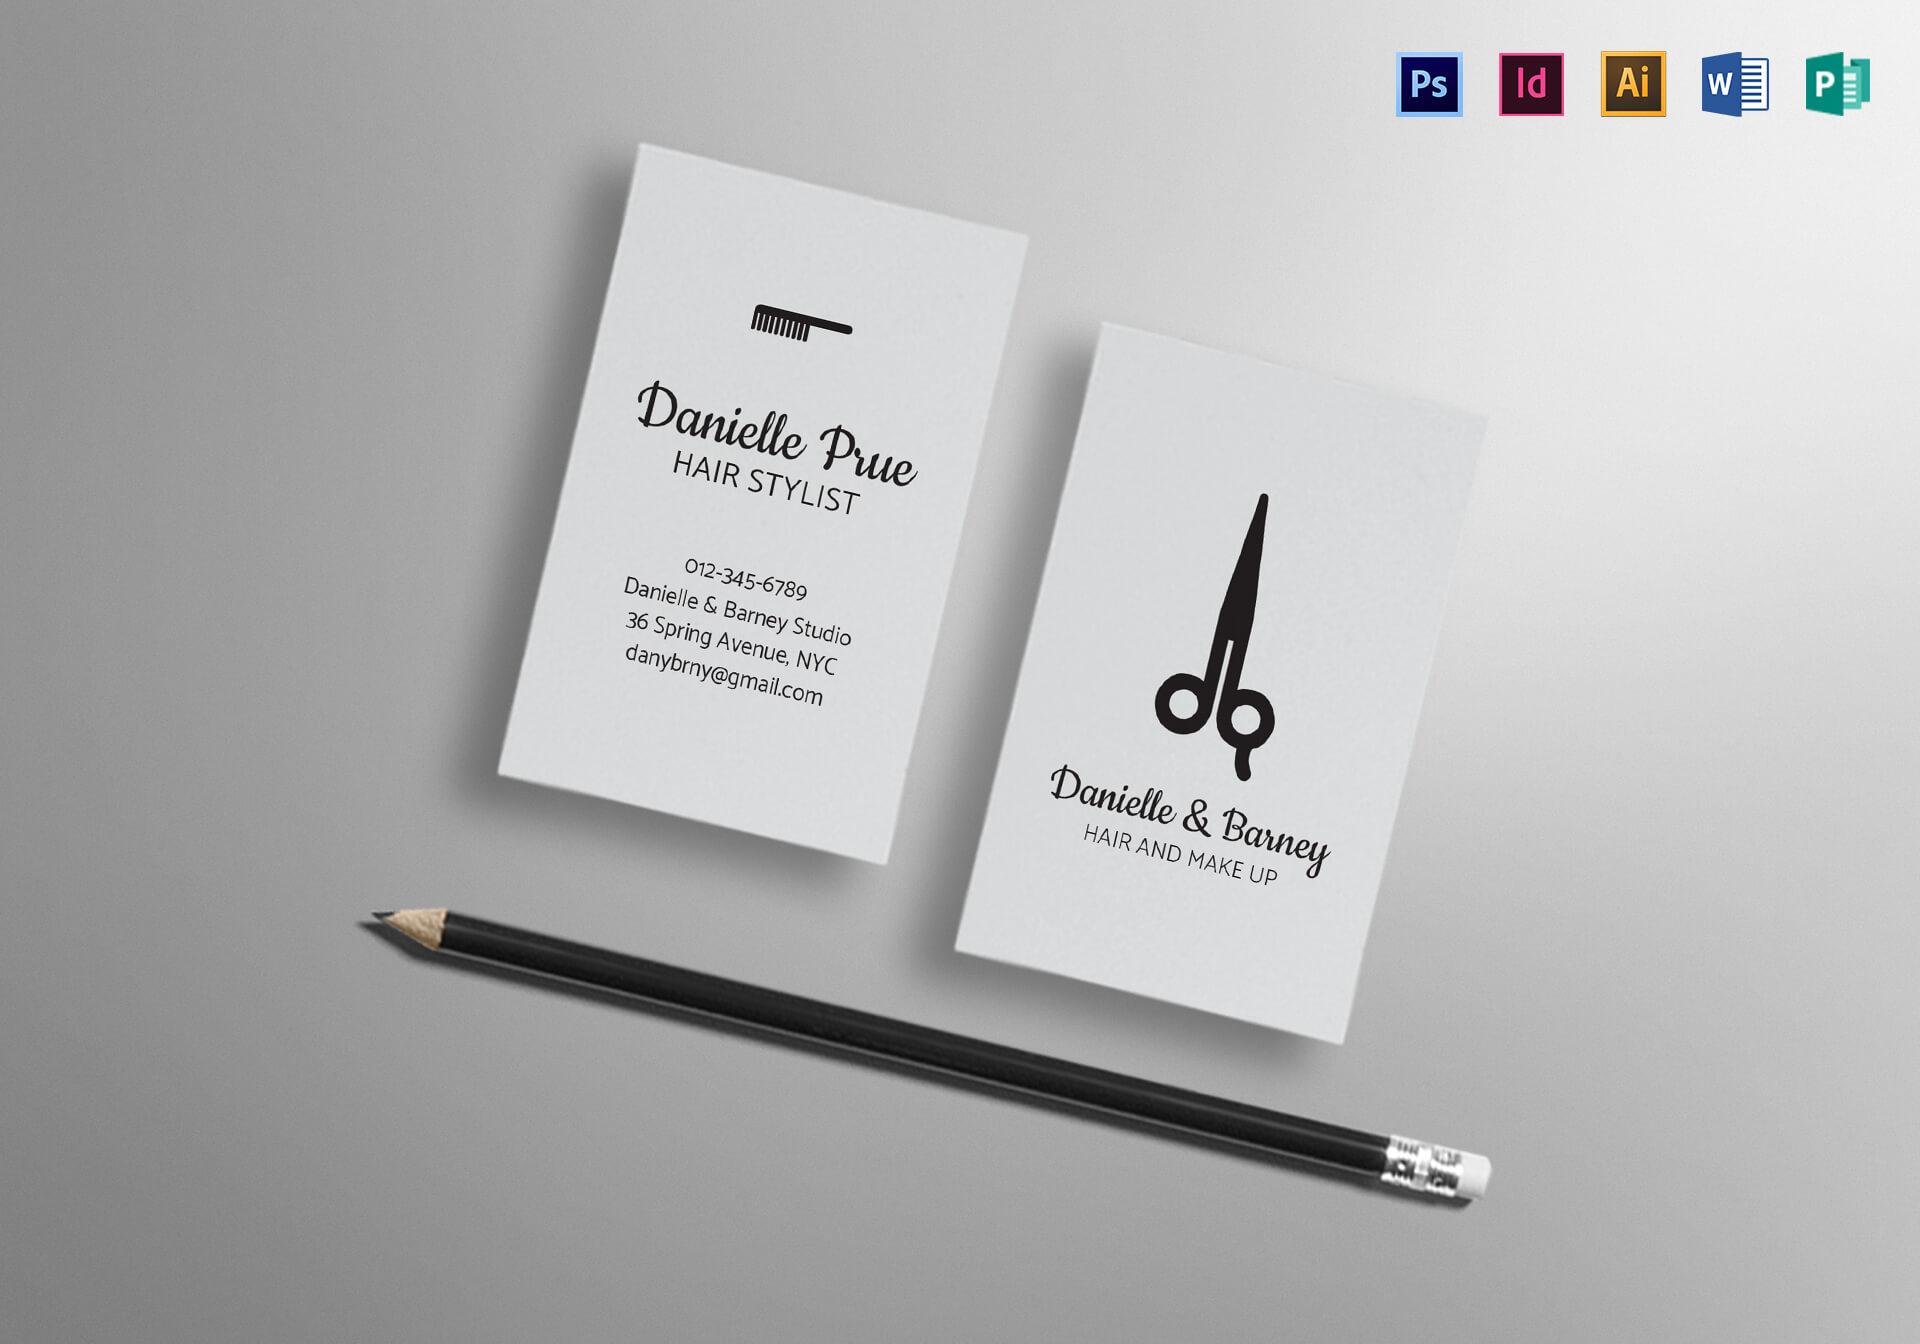 Hair Stylist Business Card Template regarding Hair Salon Business Card Template